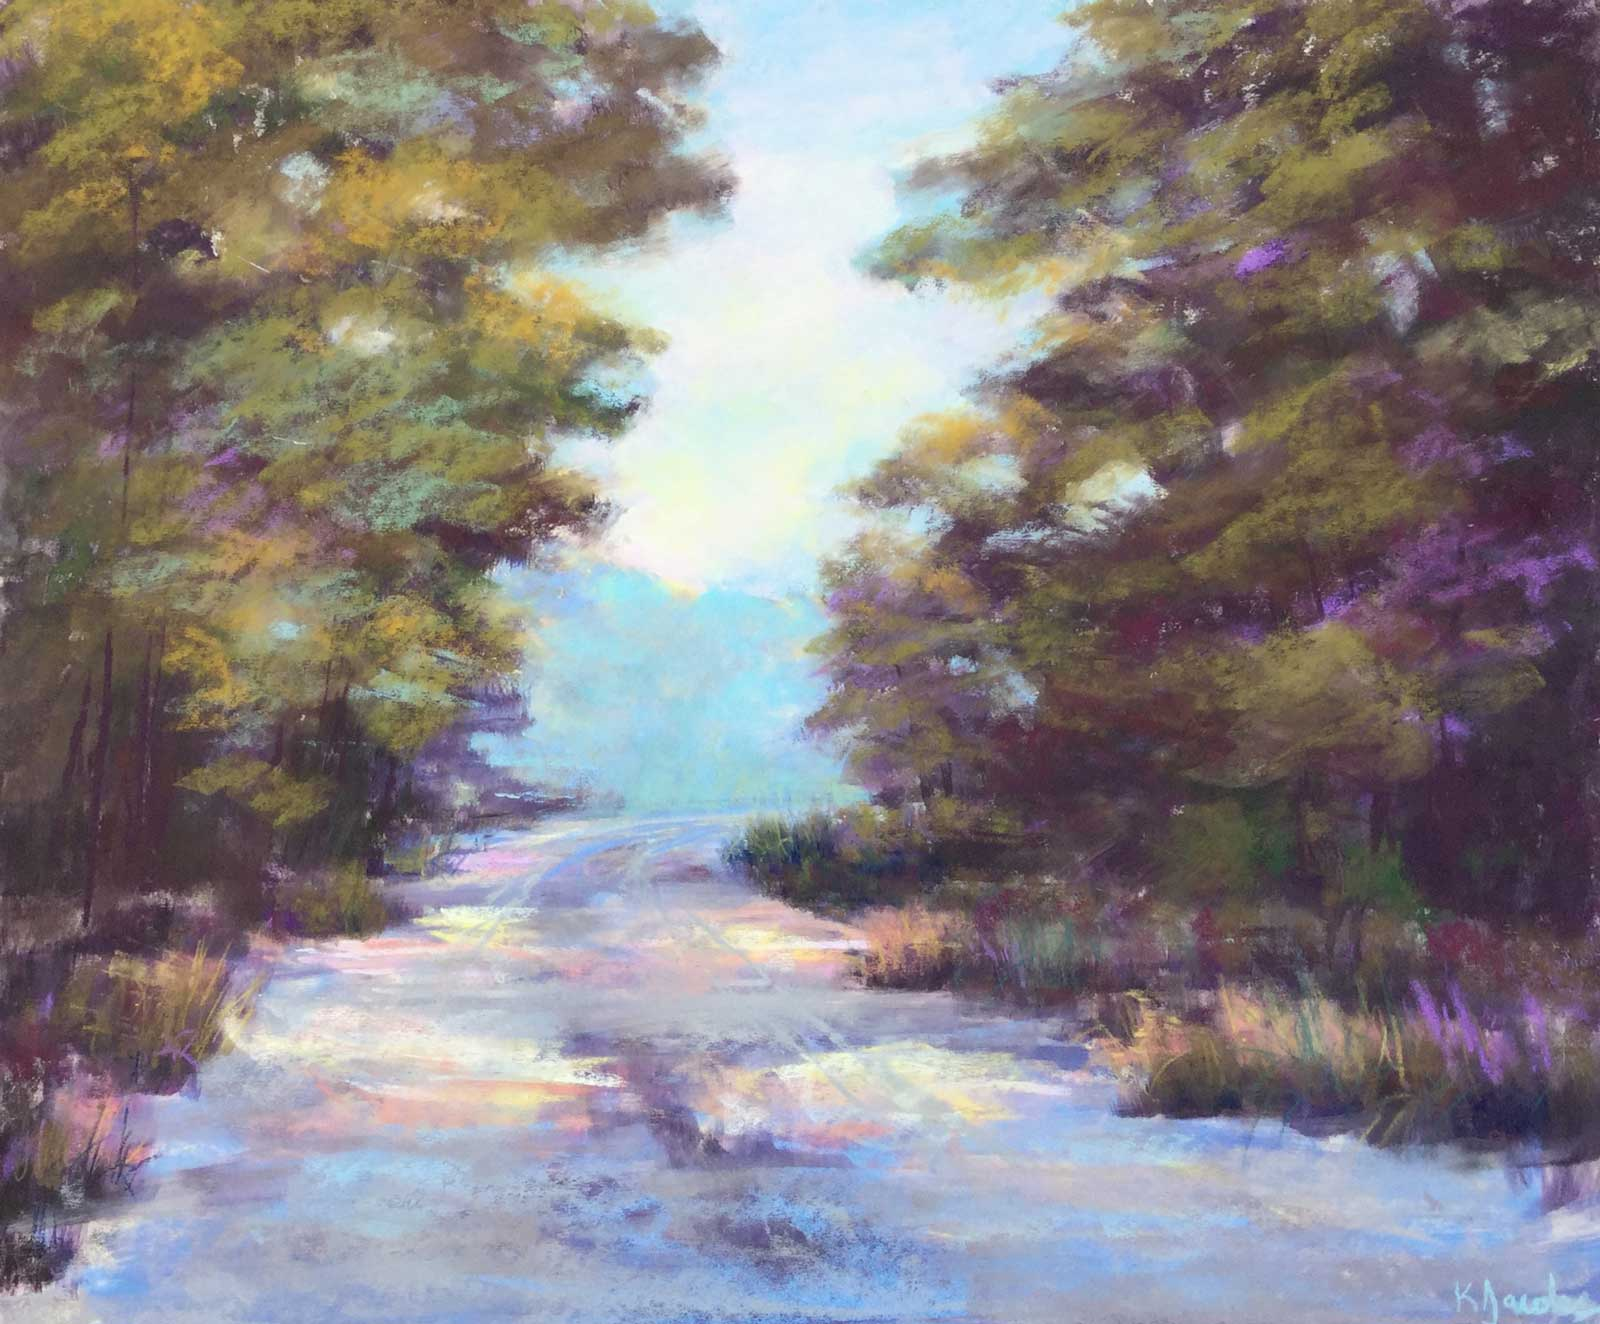 Kellie Jacobs, Making My Way Home, Pastel, 20x24